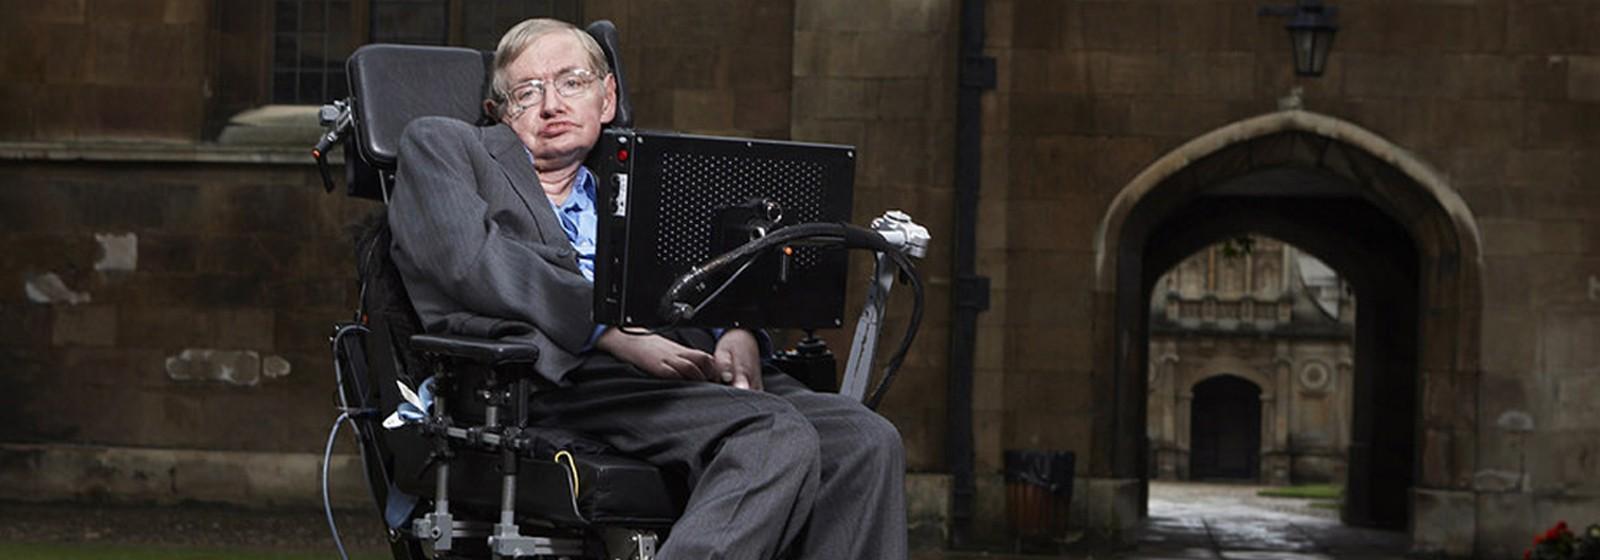 Dara O'brian entrevista Stephen Hawking